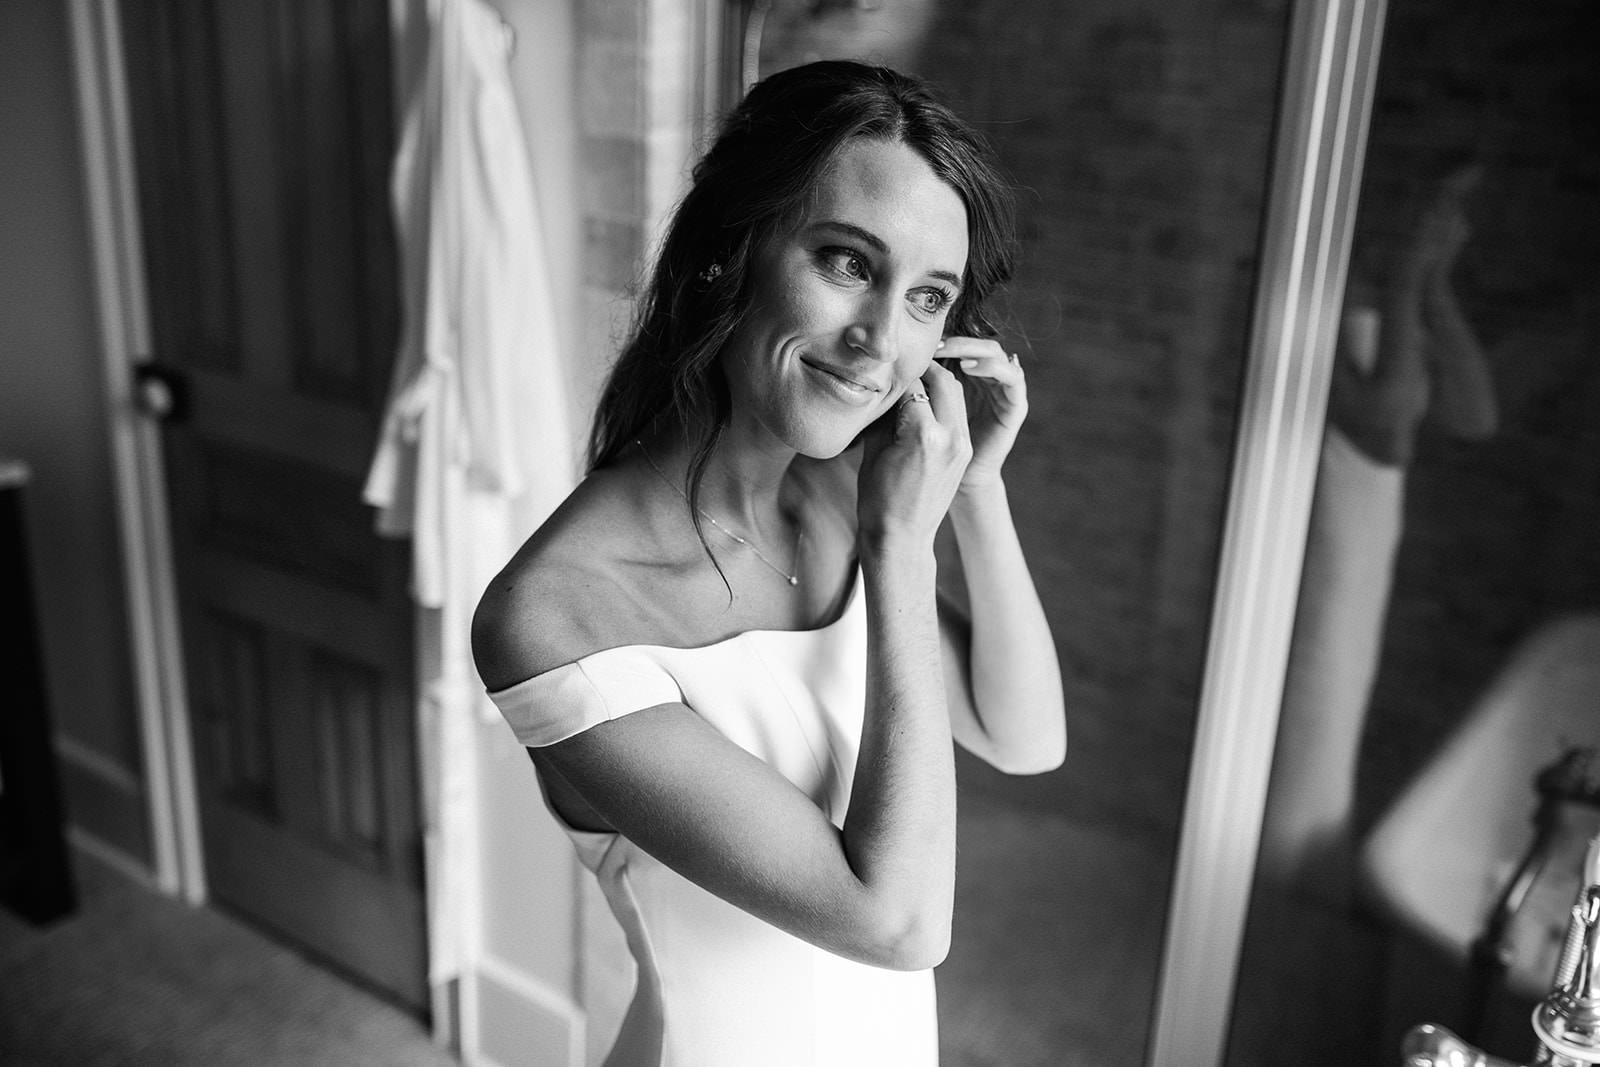 documentary-wedding-photograpehrs-nashville.jpg